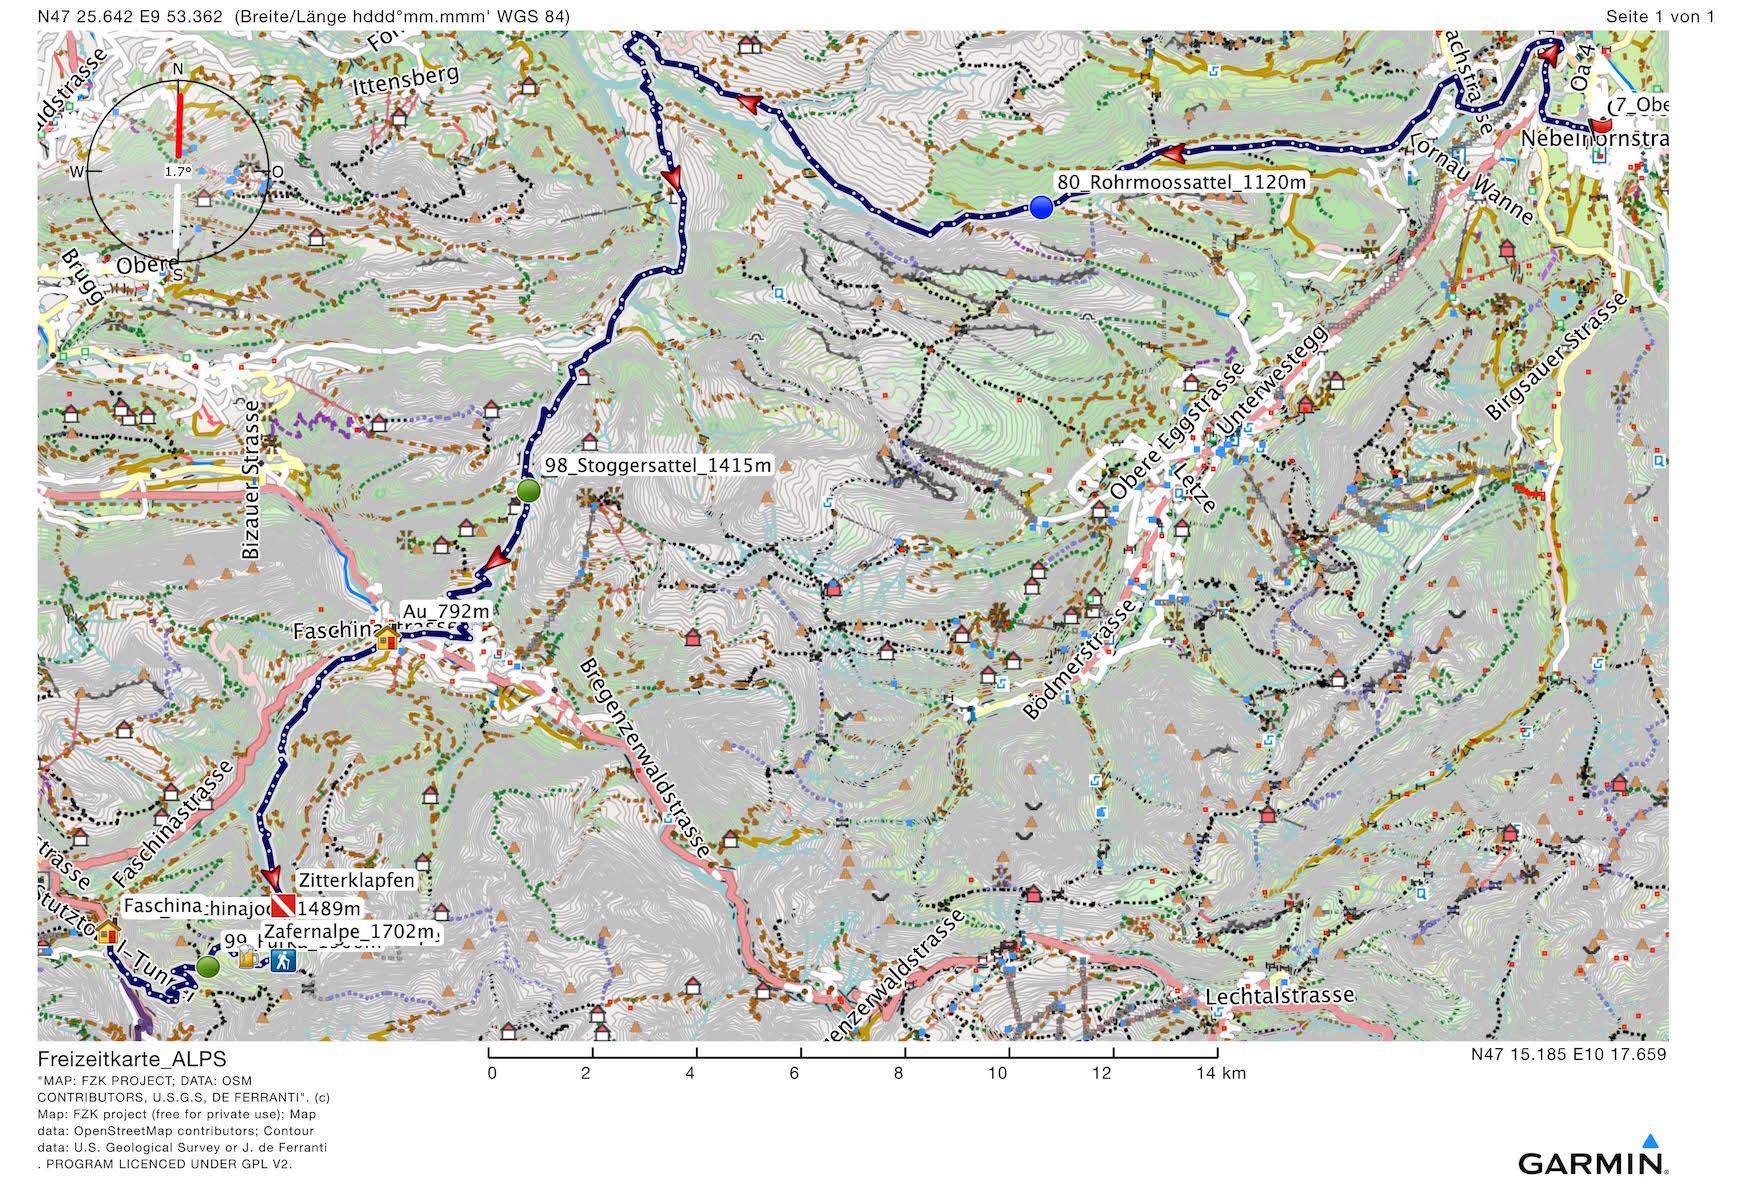 MTB Alpencross, Route Oberstdorf - Faschina